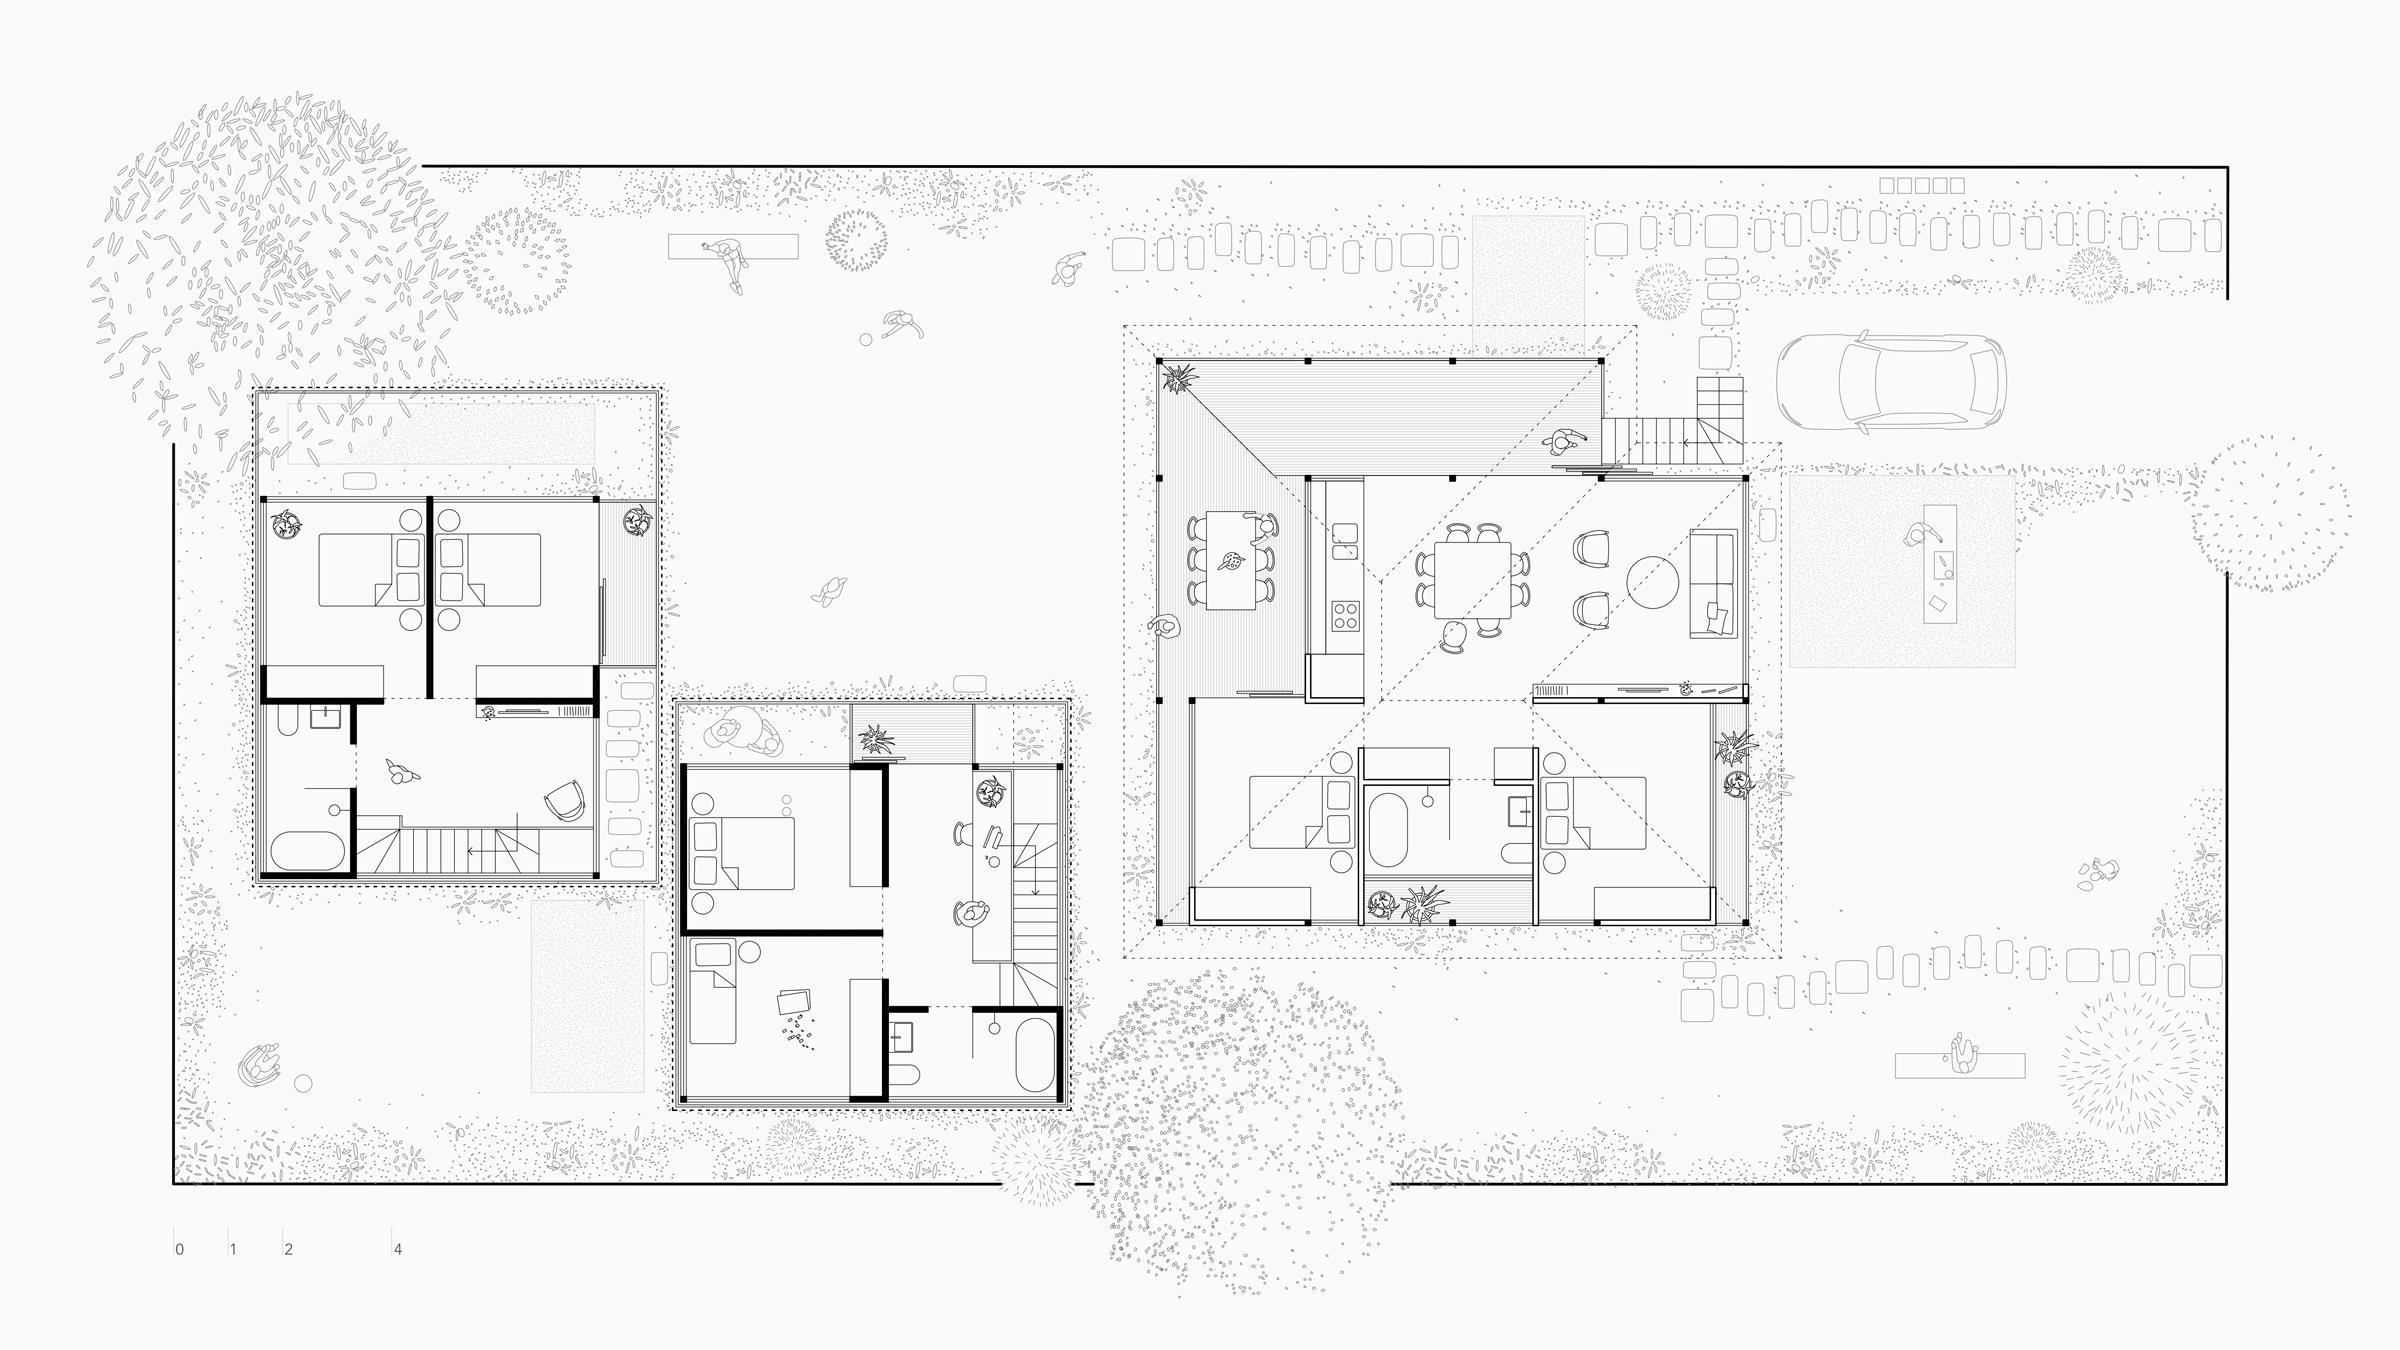 QUEENSLAND-RESIDENTIAL-ARCHITECT-TRIAS-STUDIO-QUEENSLAND-HOUSE-D01